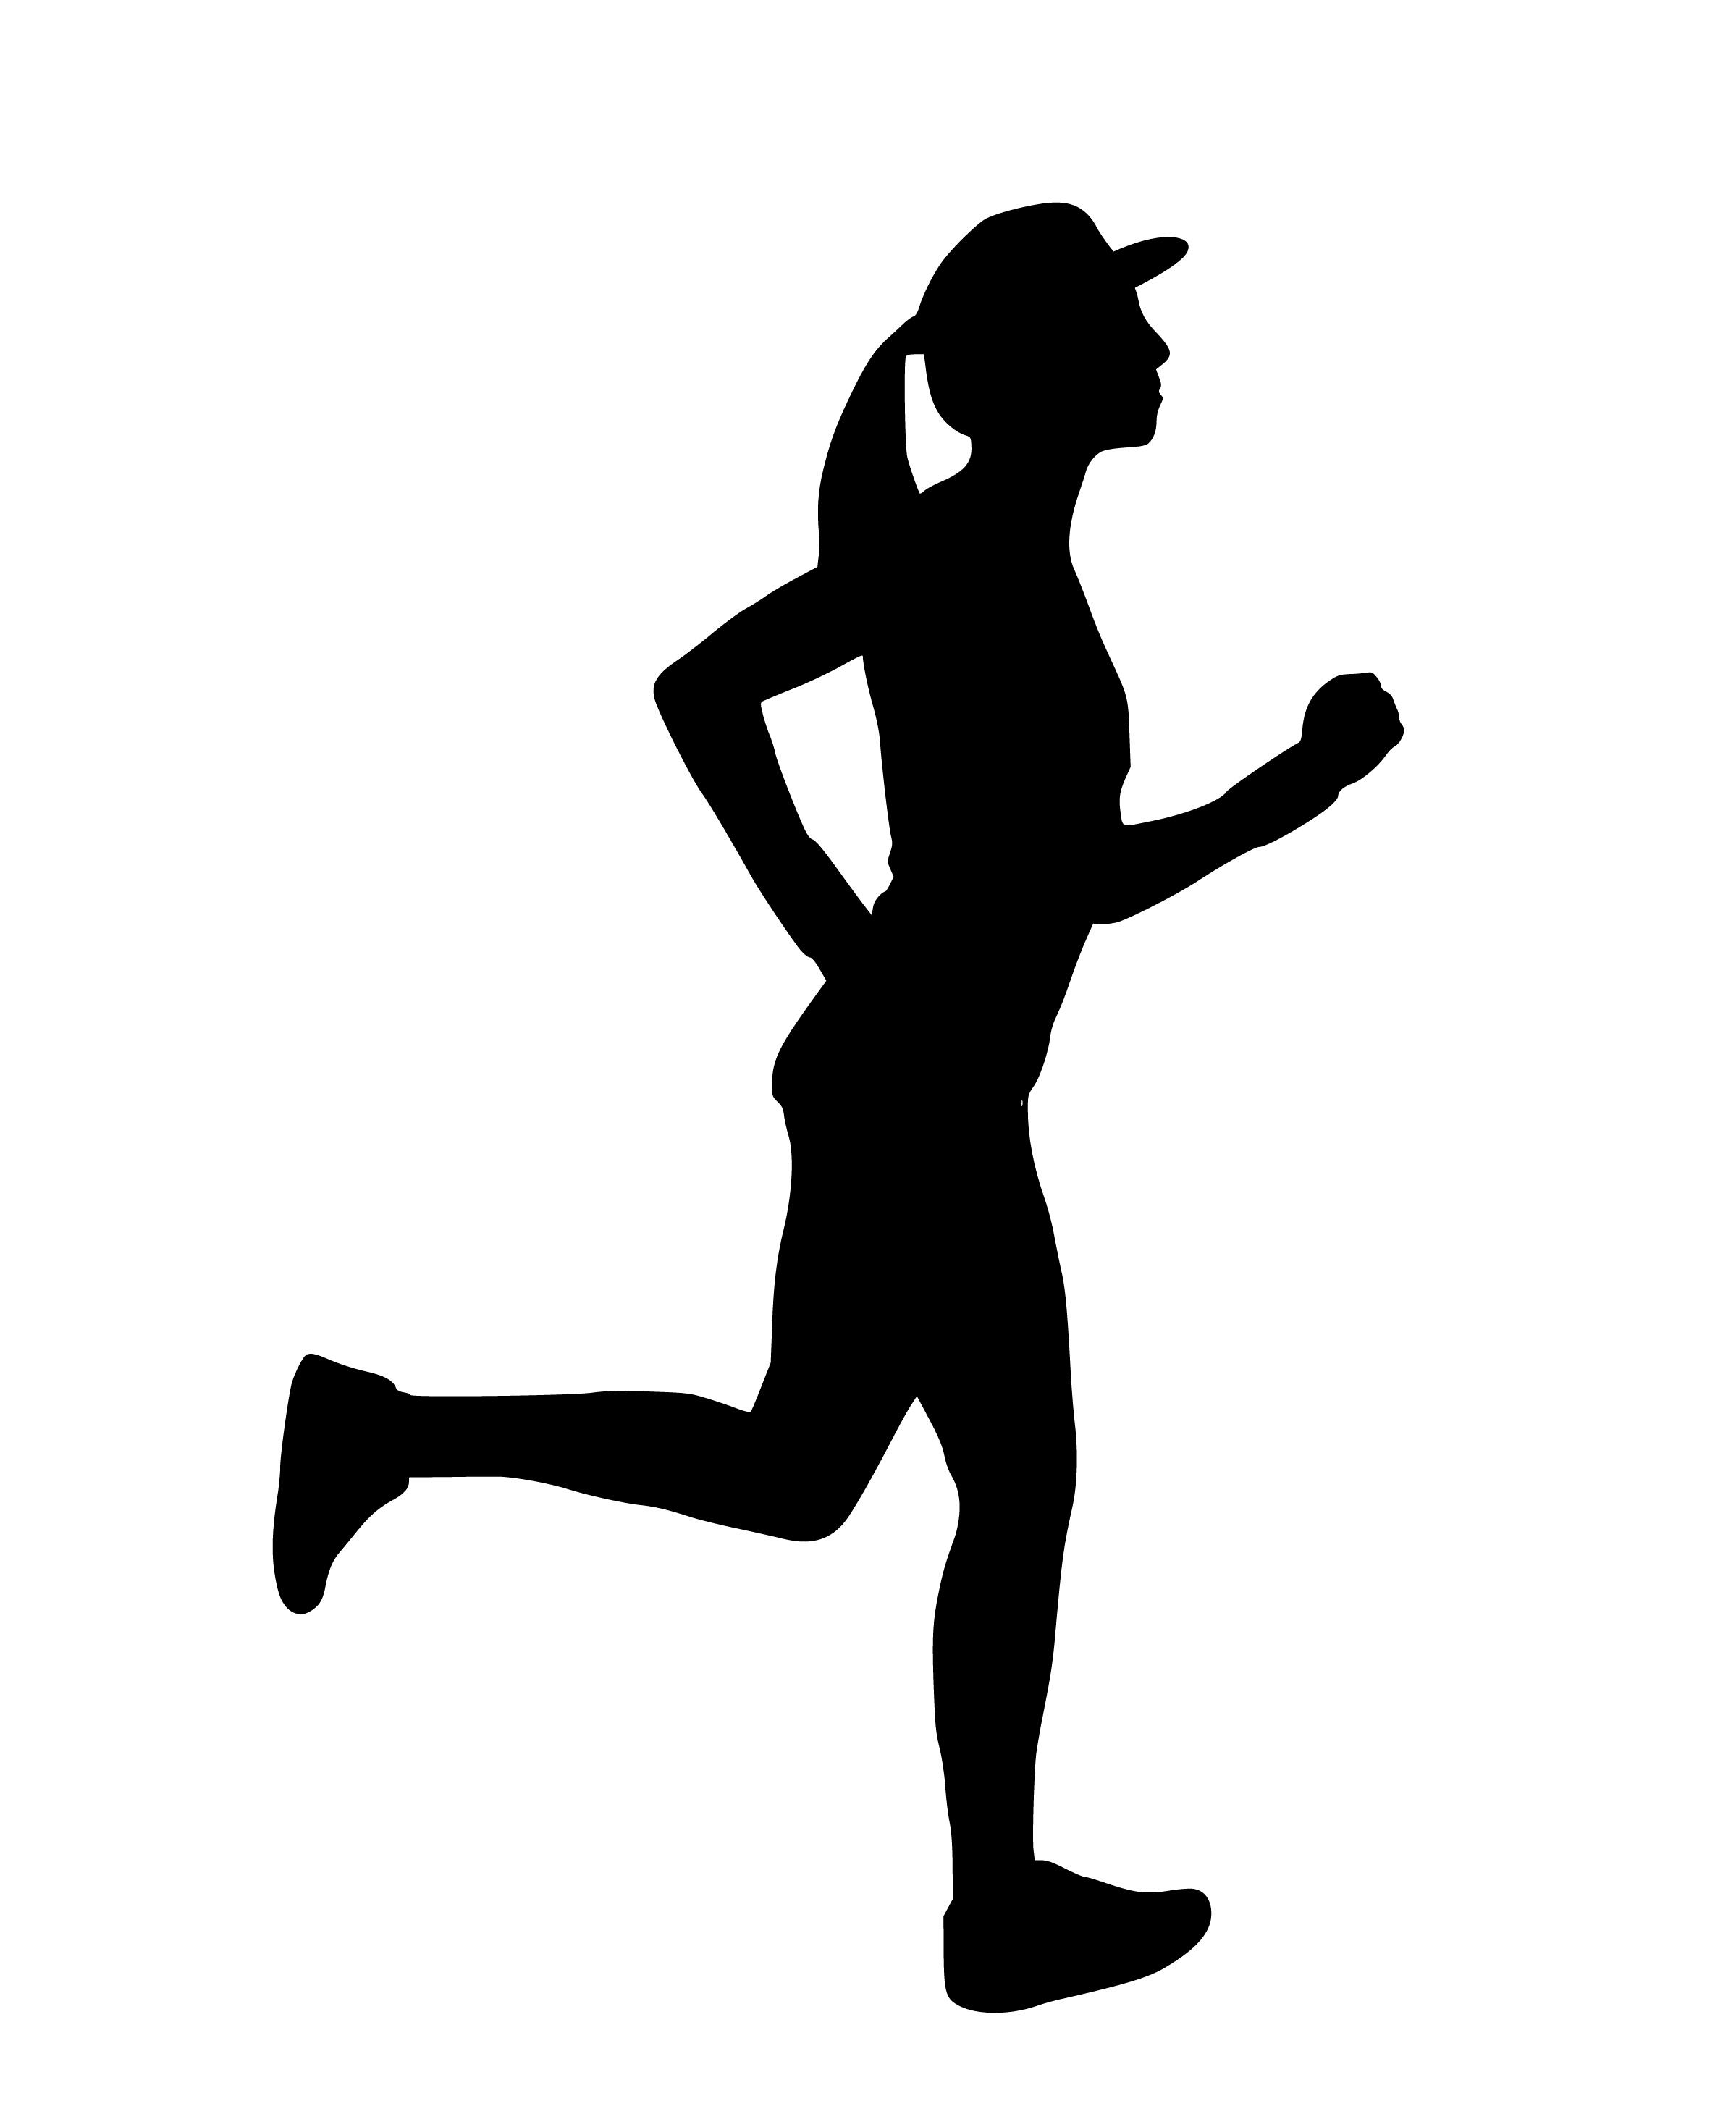 jogging picture femme